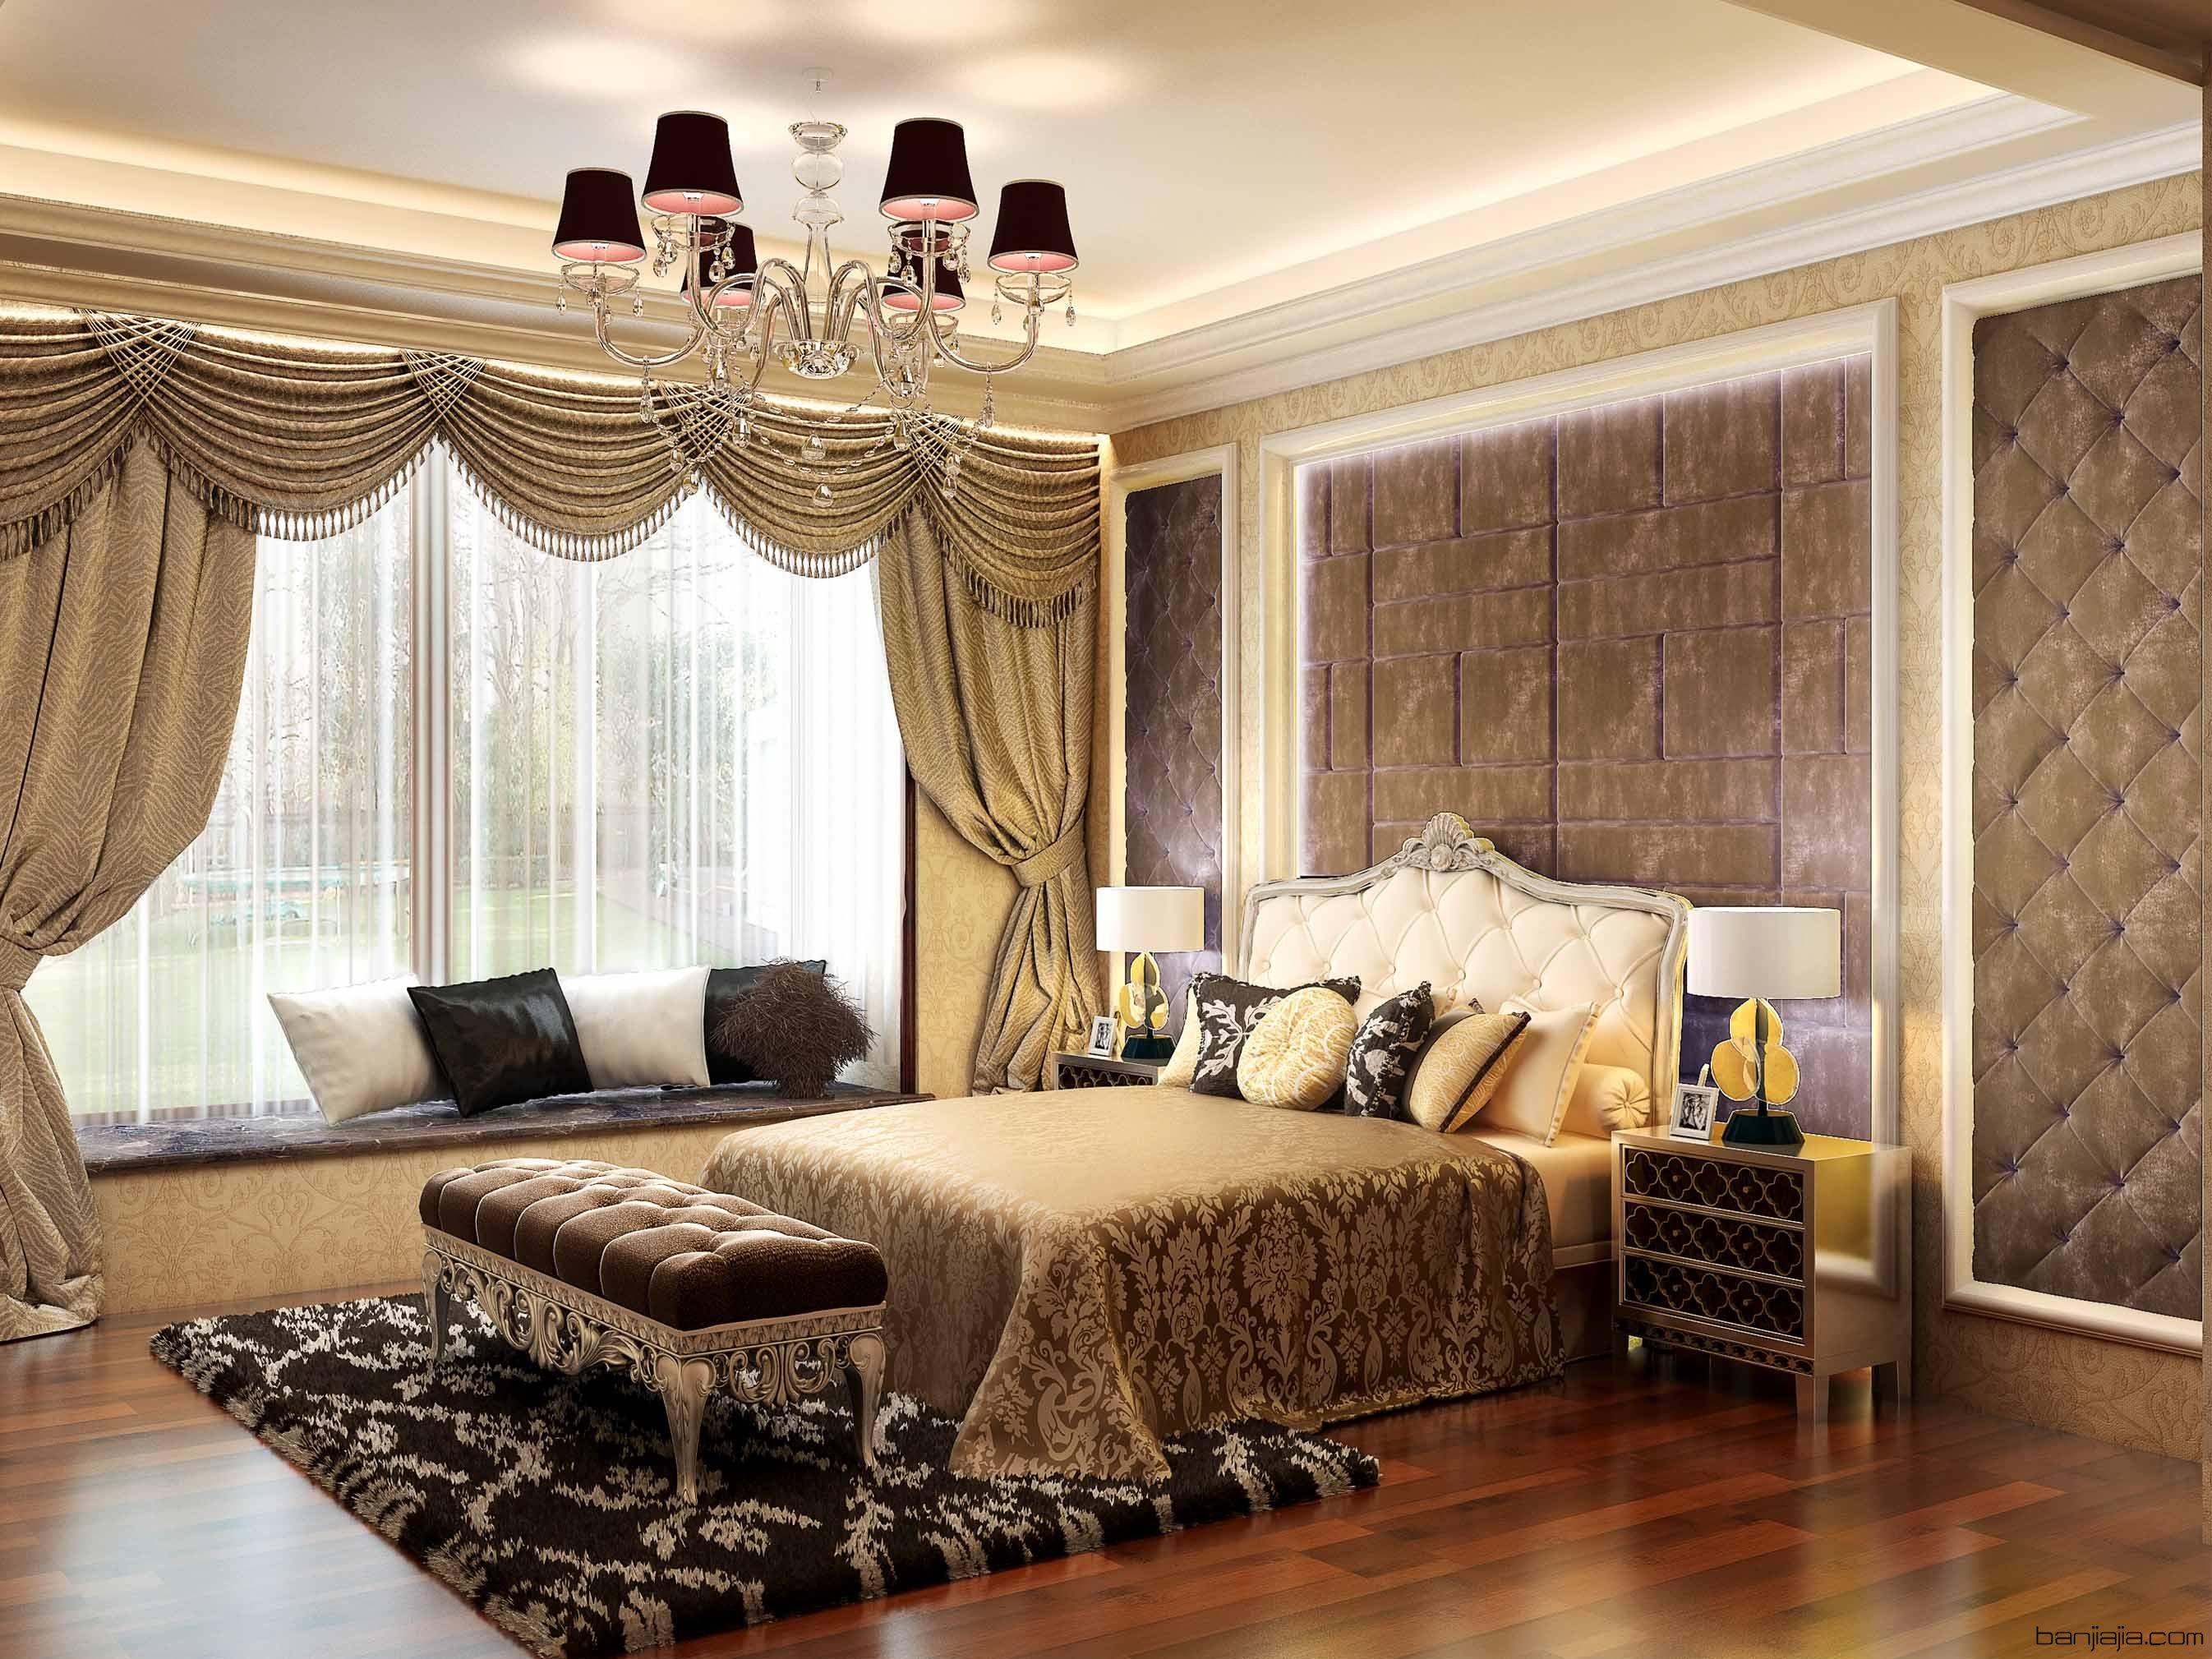 欧式卧室   3dmax2009  vr2.0  附材质灯光